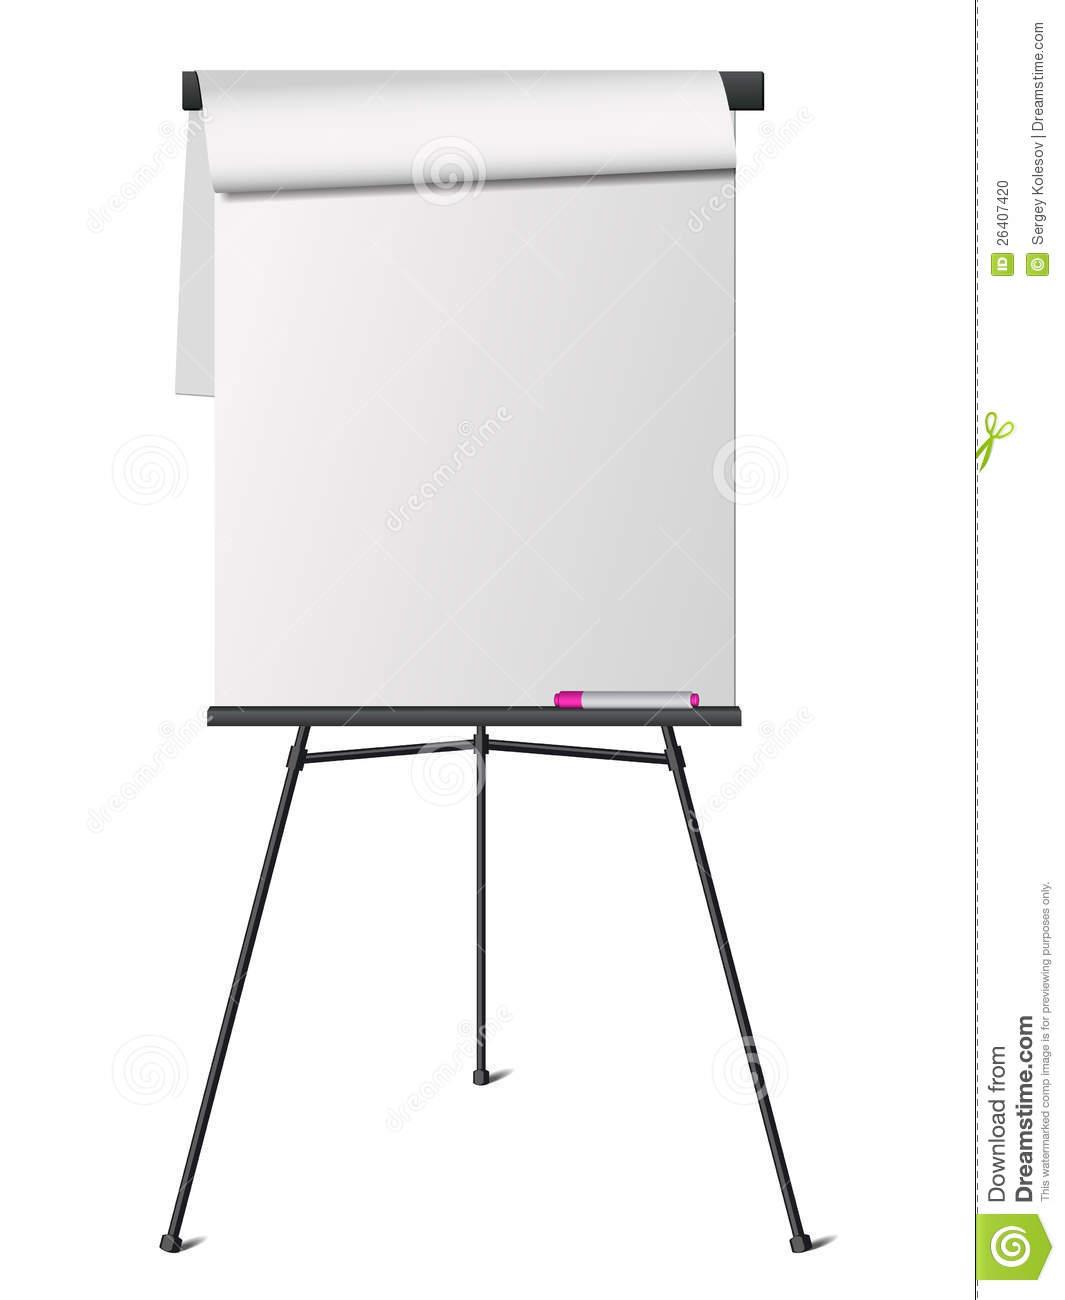 Flip chart stock vector. Illustration of presentation.